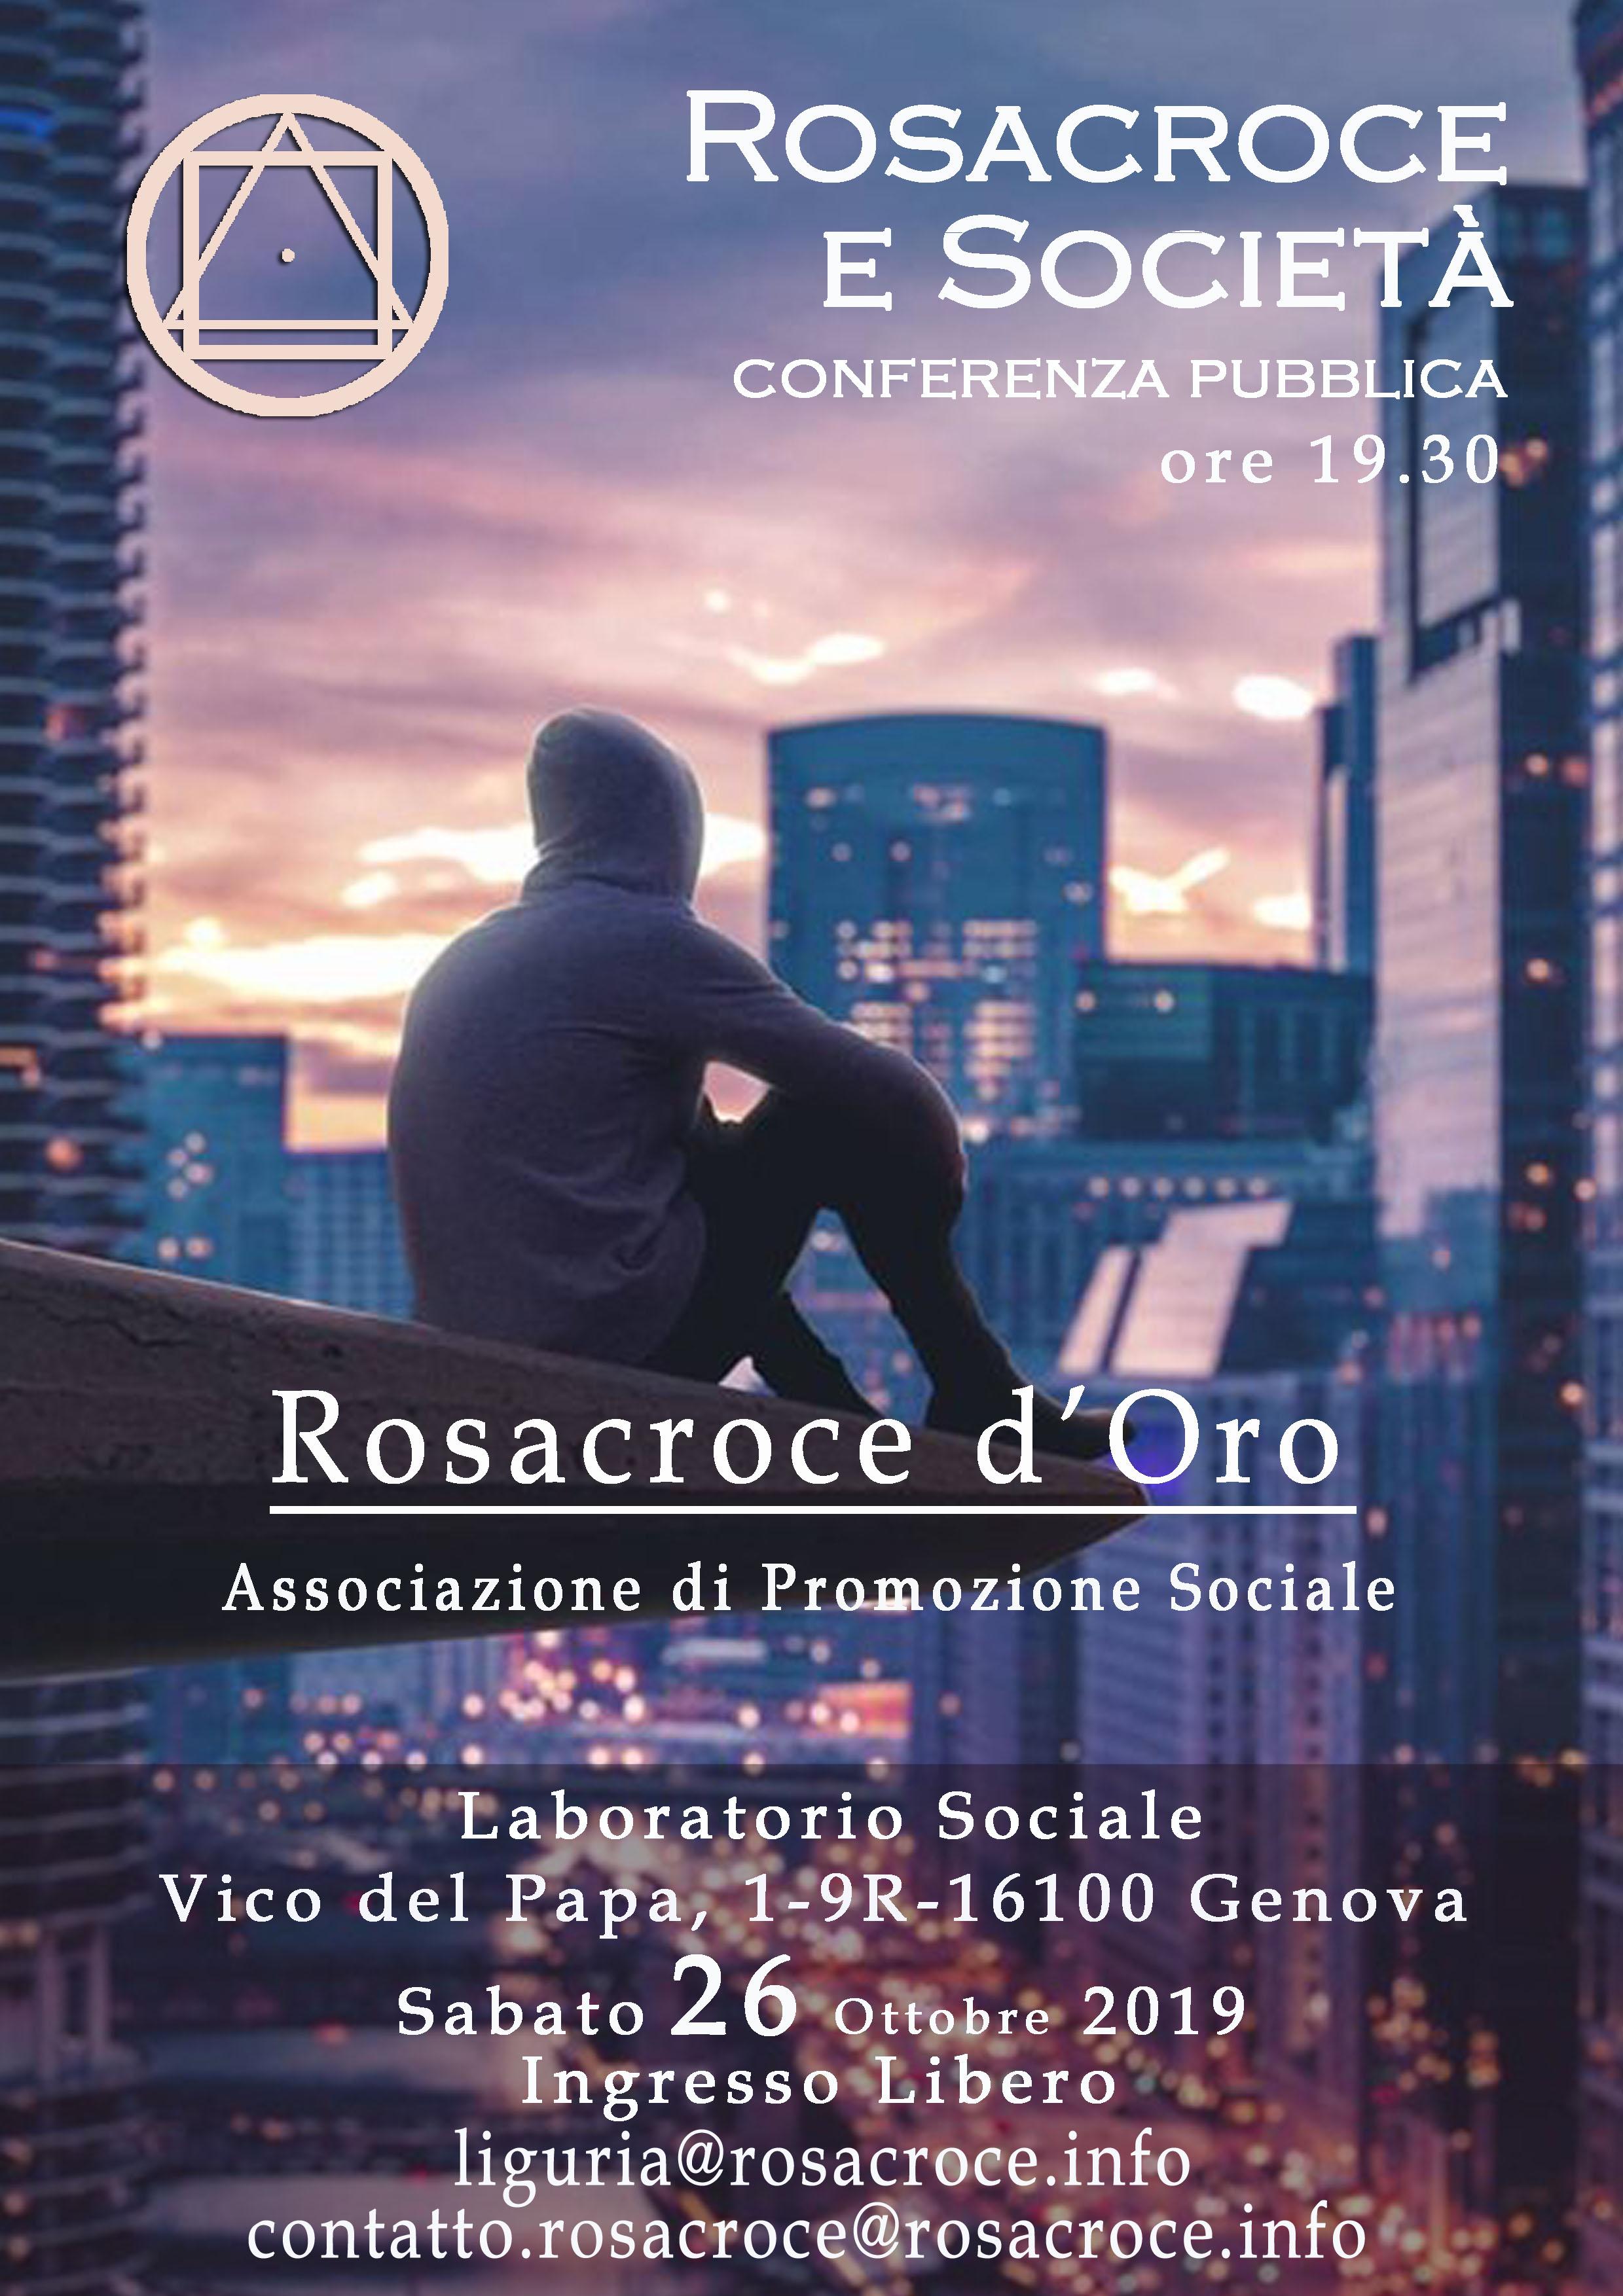 Rosacroce e Società